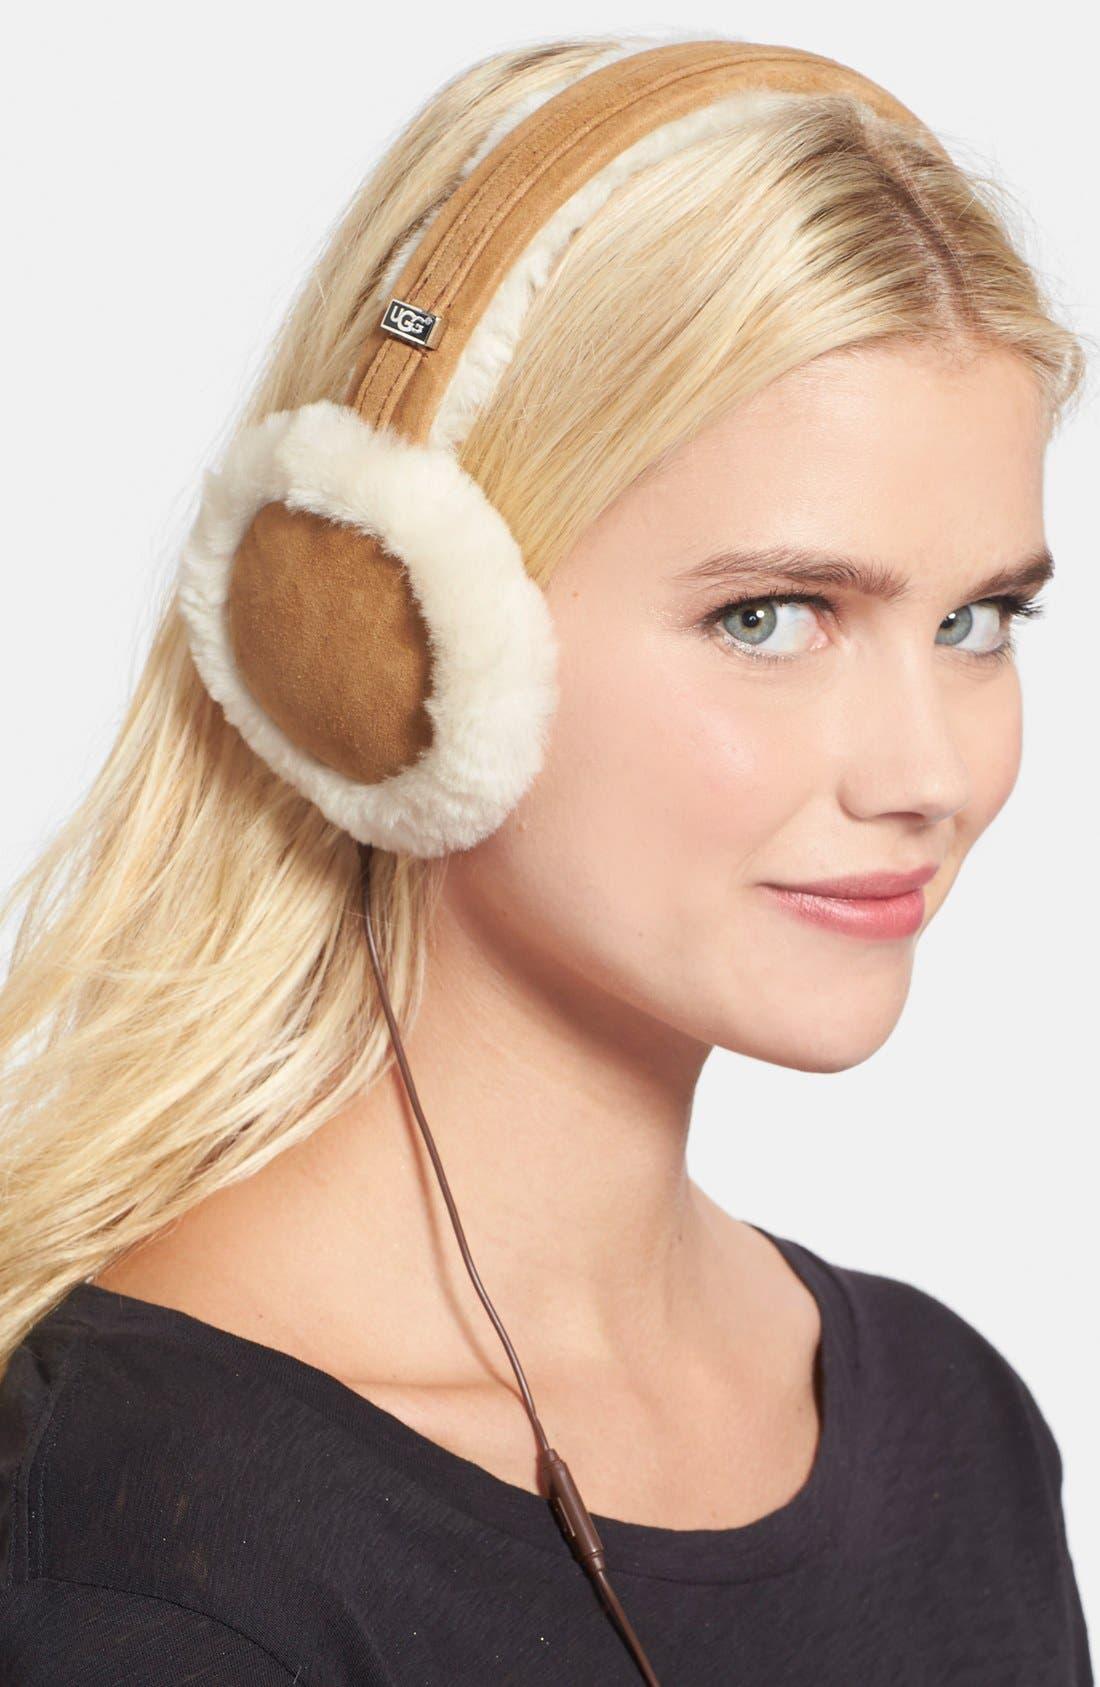 Australia 'Classic' Genuine Shearling Headphone Earmuffs,                             Main thumbnail 1, color,                             250